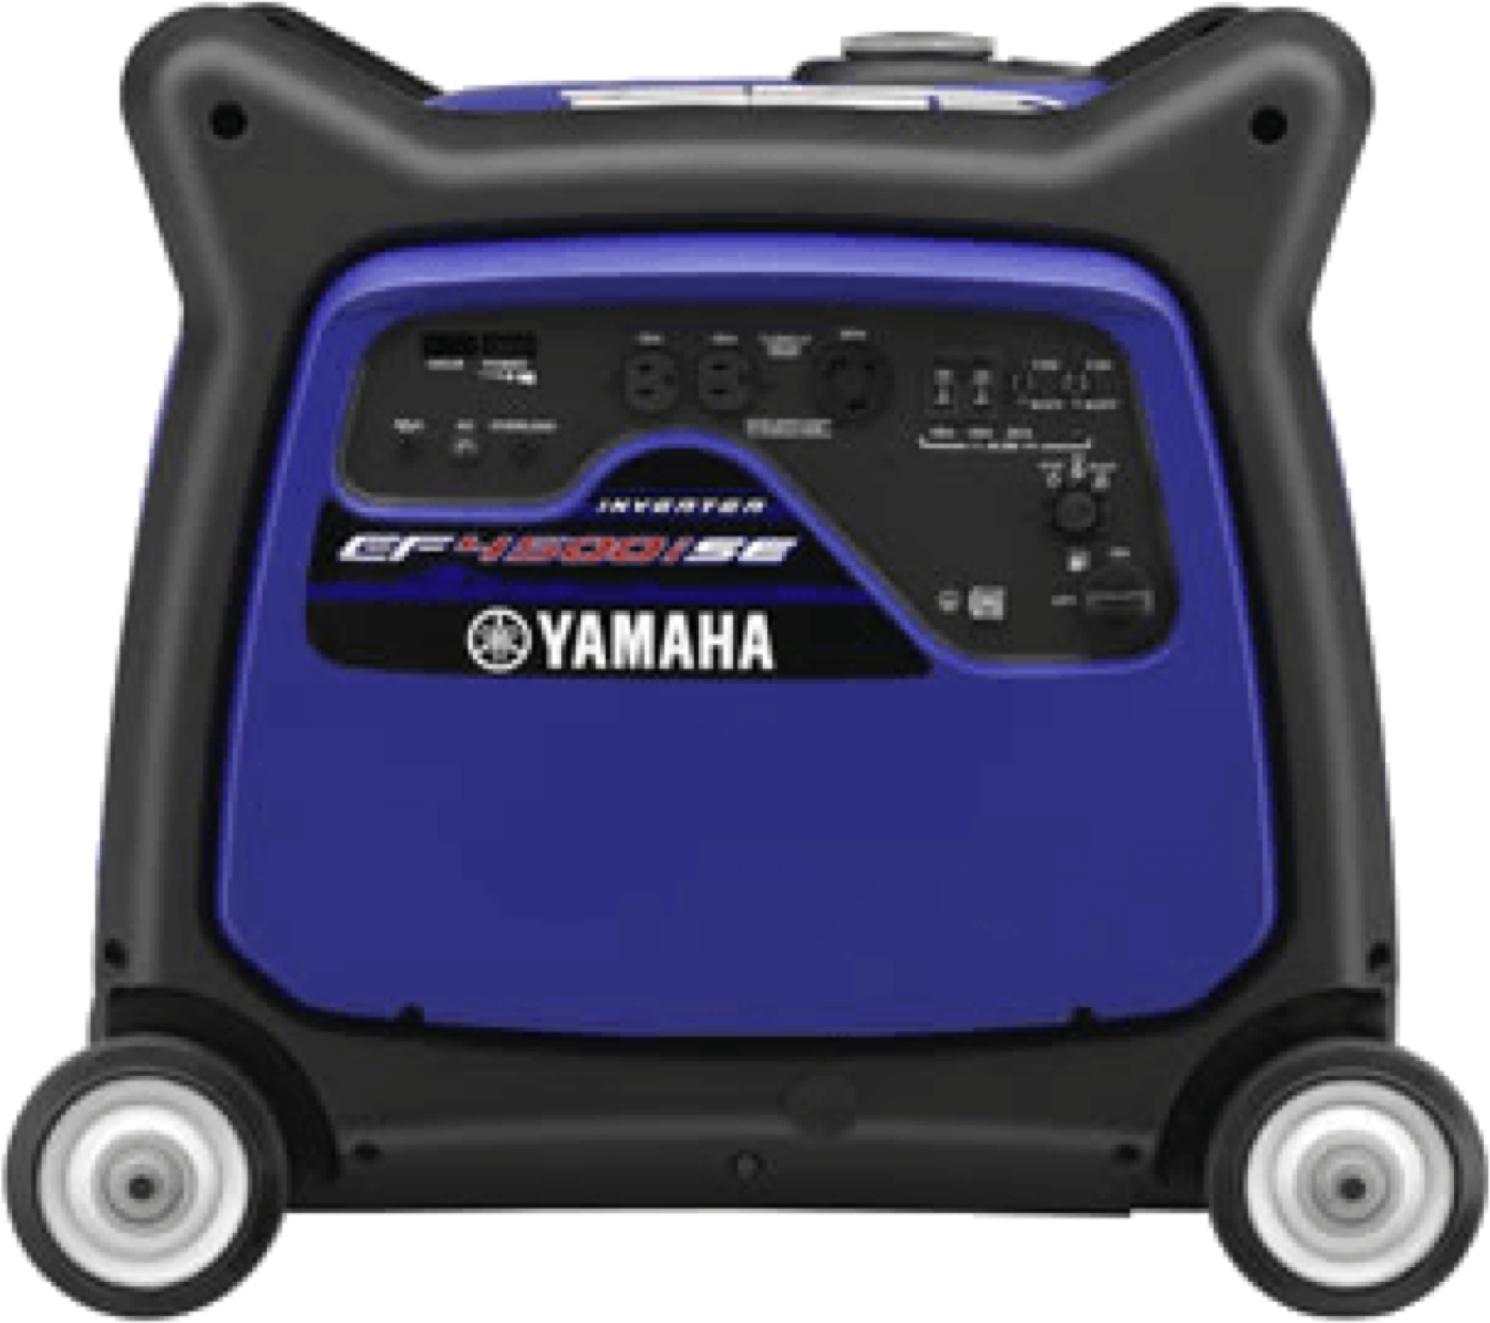 Yamaha Inverter Series EF4500ISE